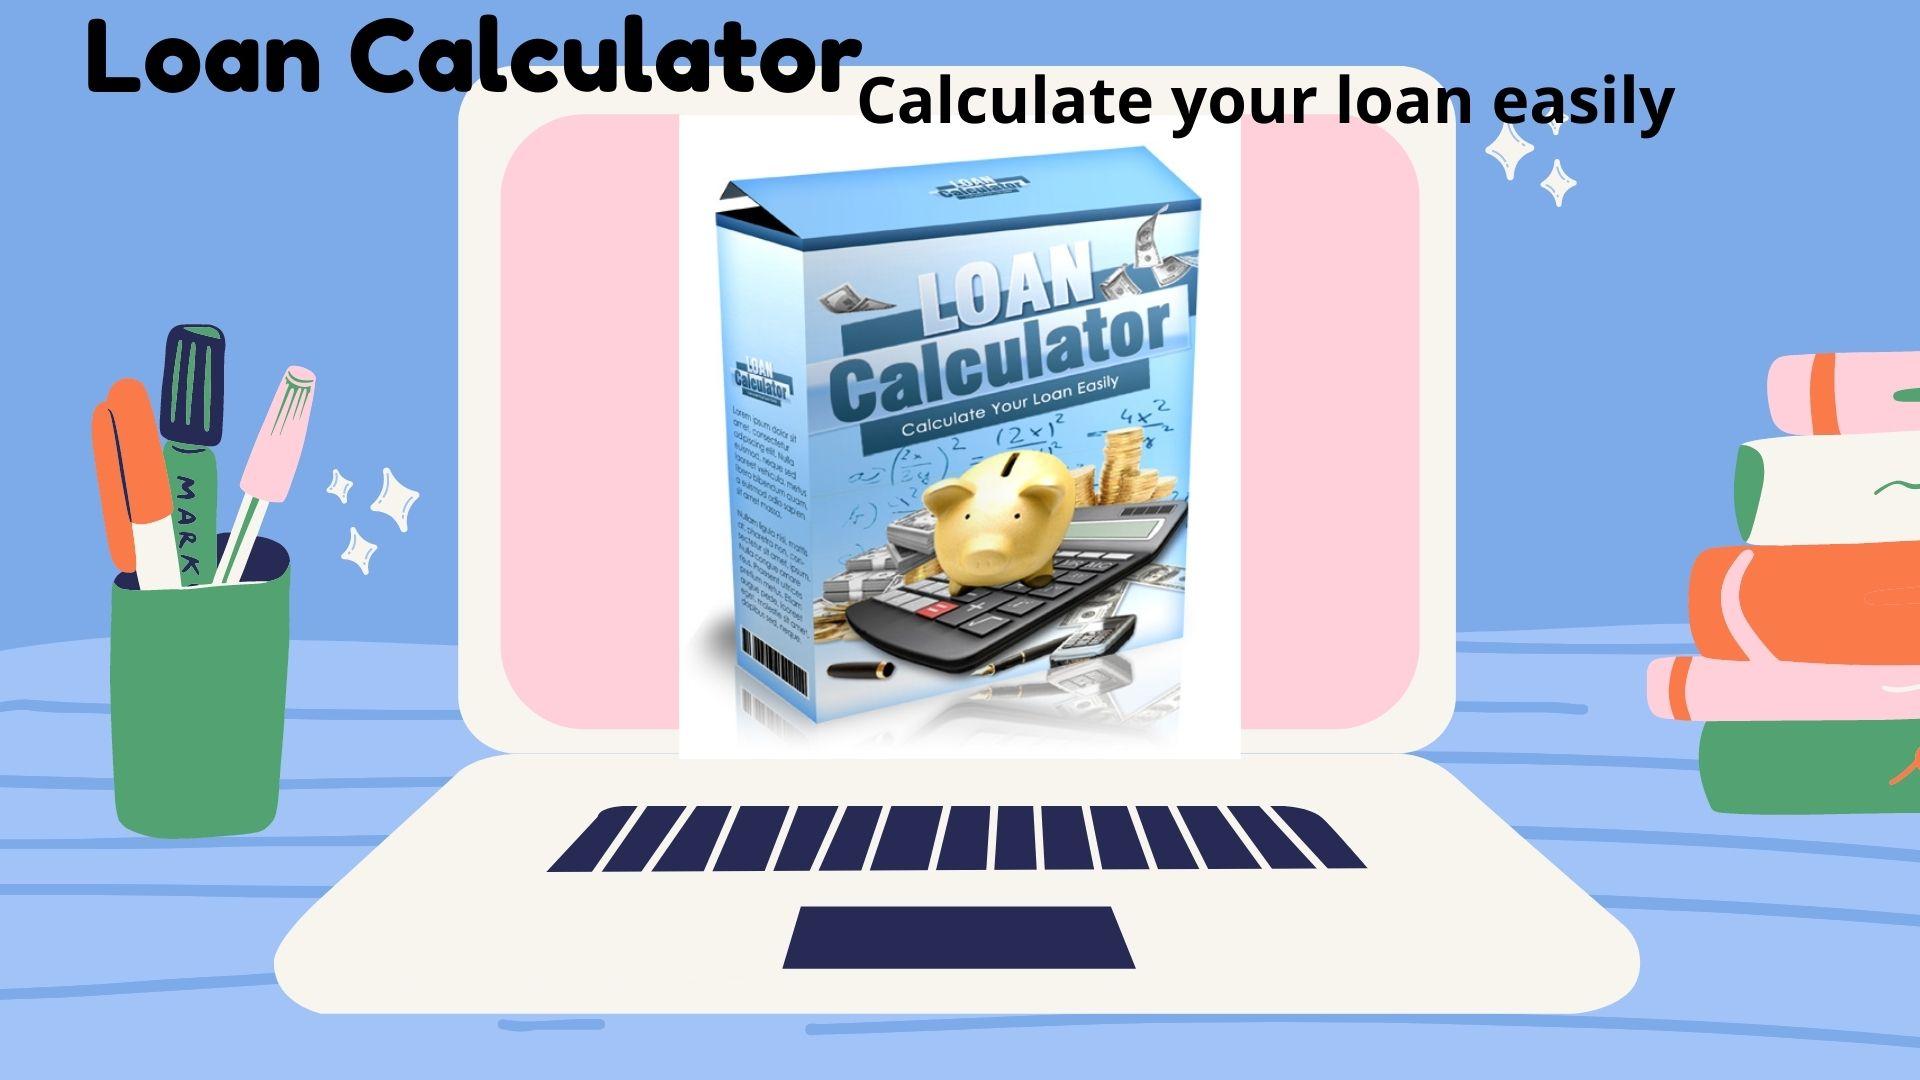 Loan Calculator Calculate your loan easily